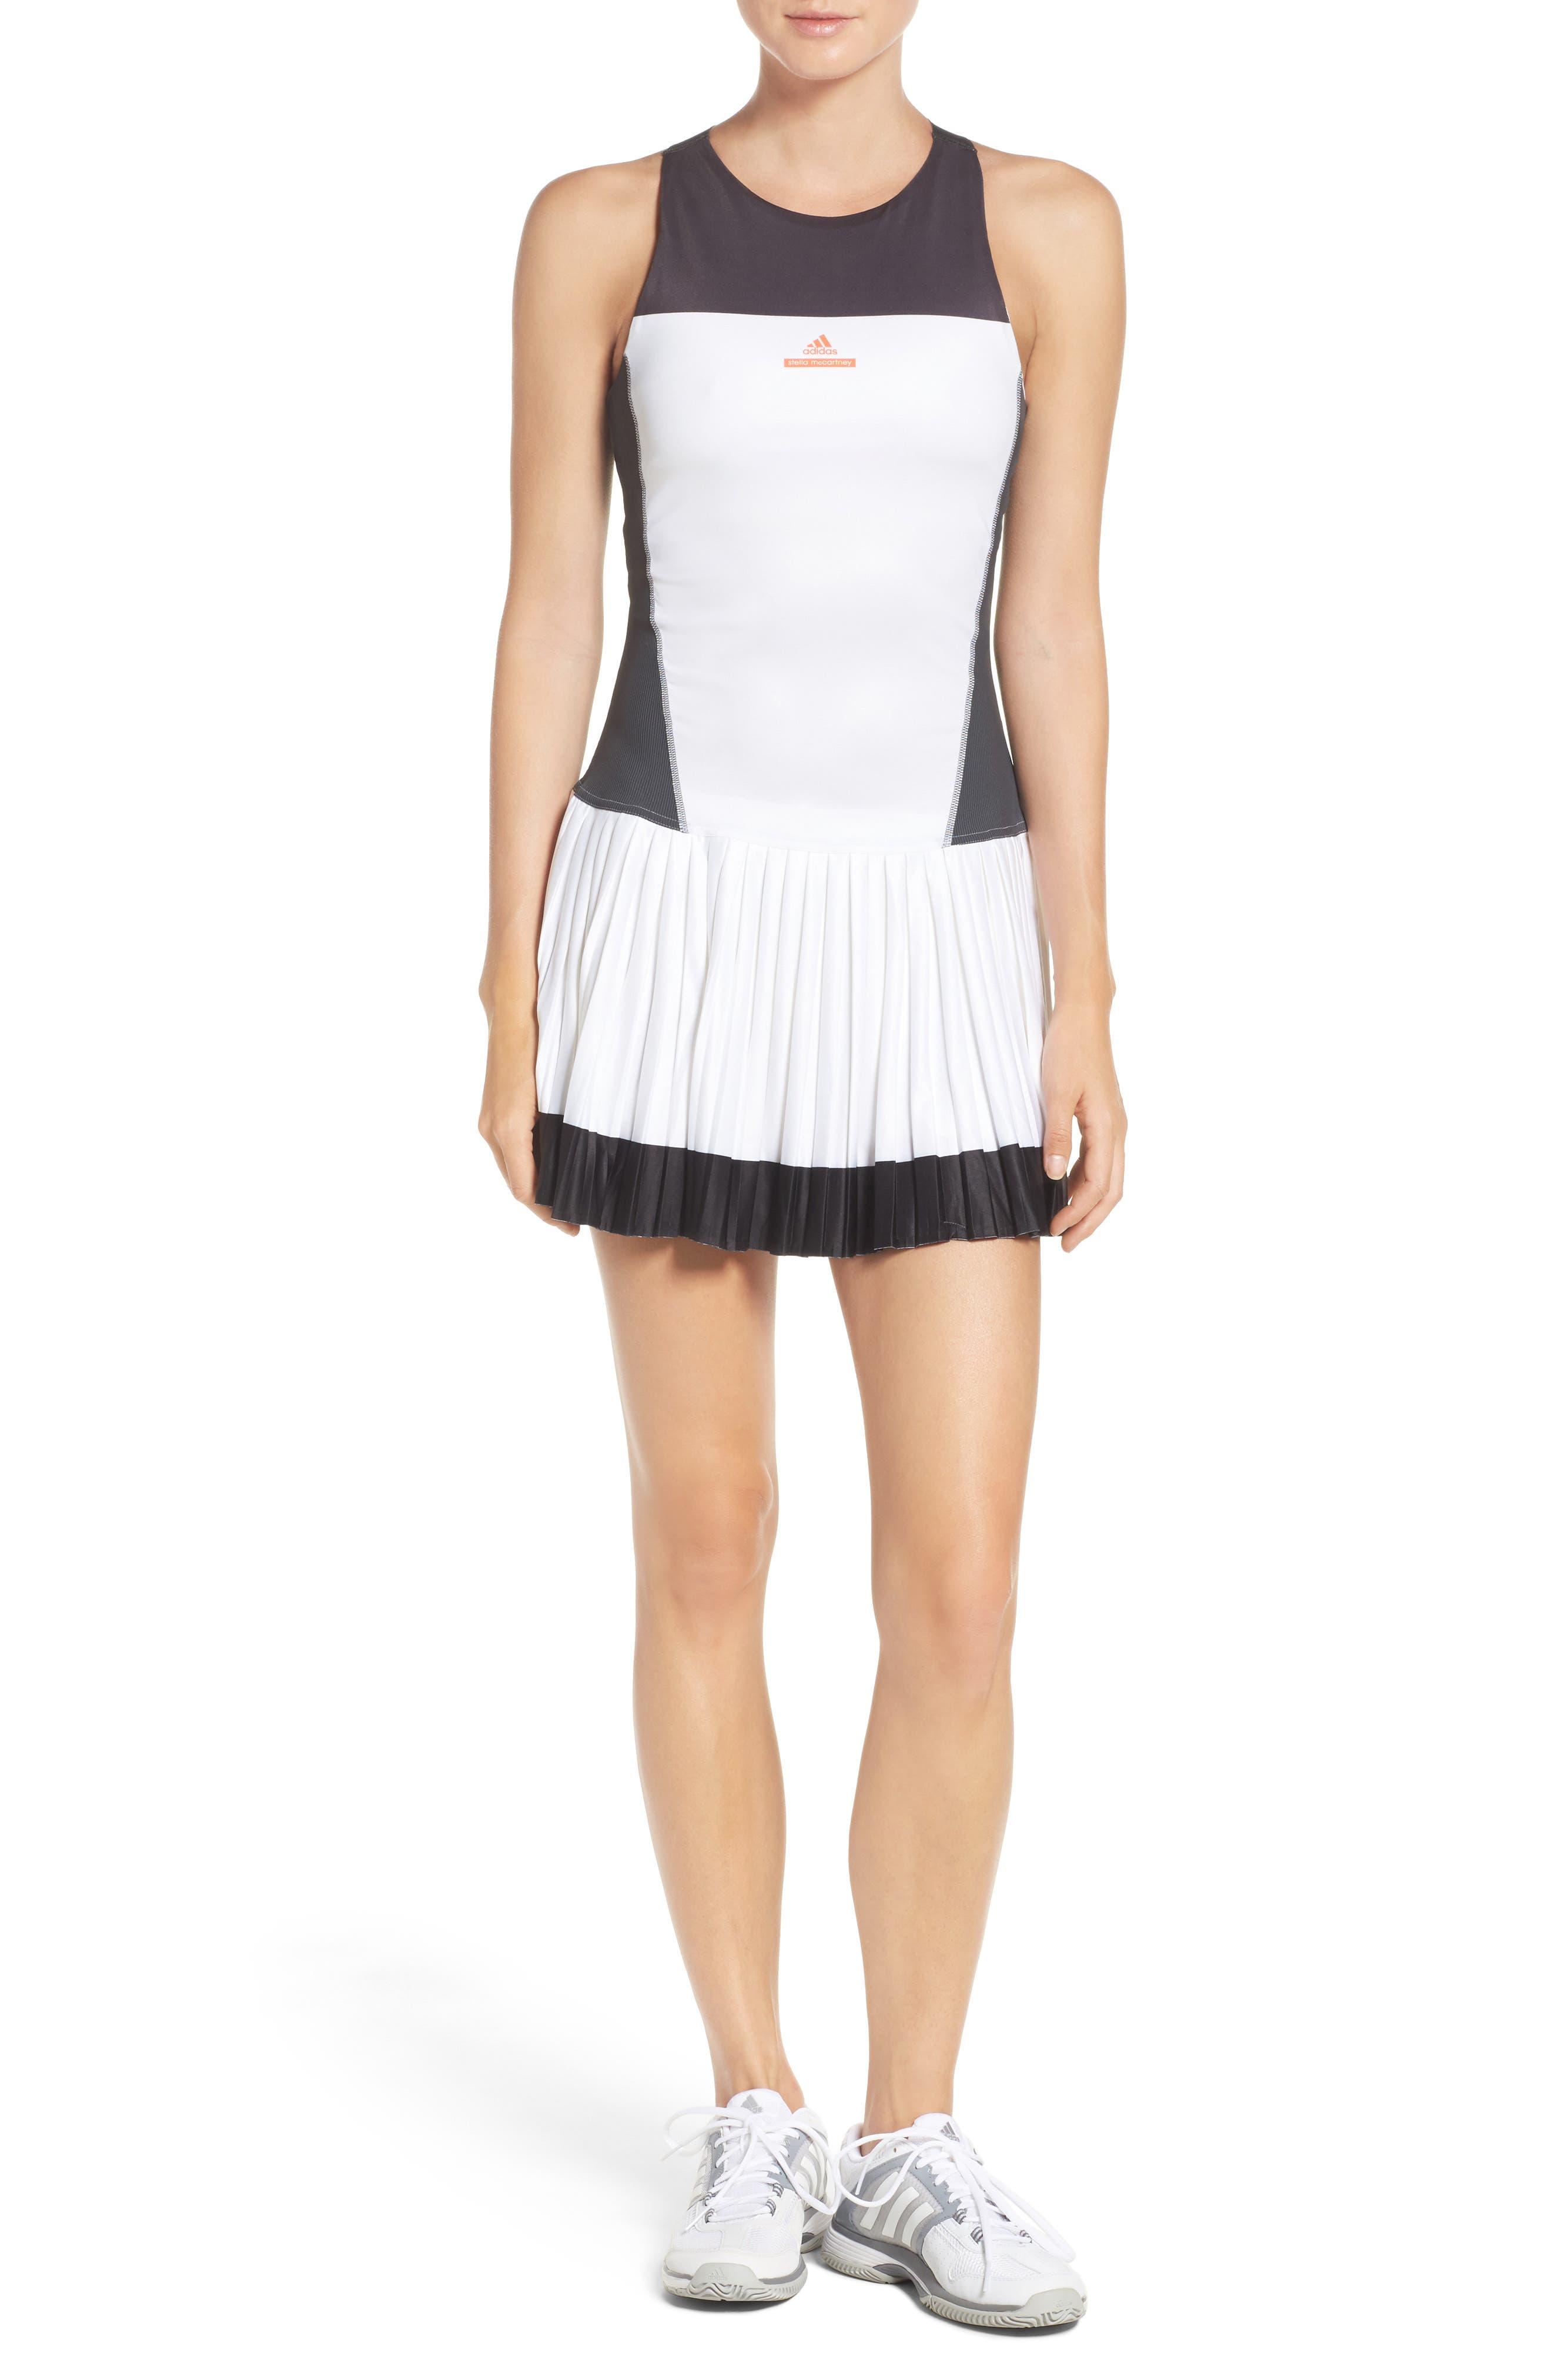 adidas by Stella McCartney Barricade Tennis Dress & Shorts Set